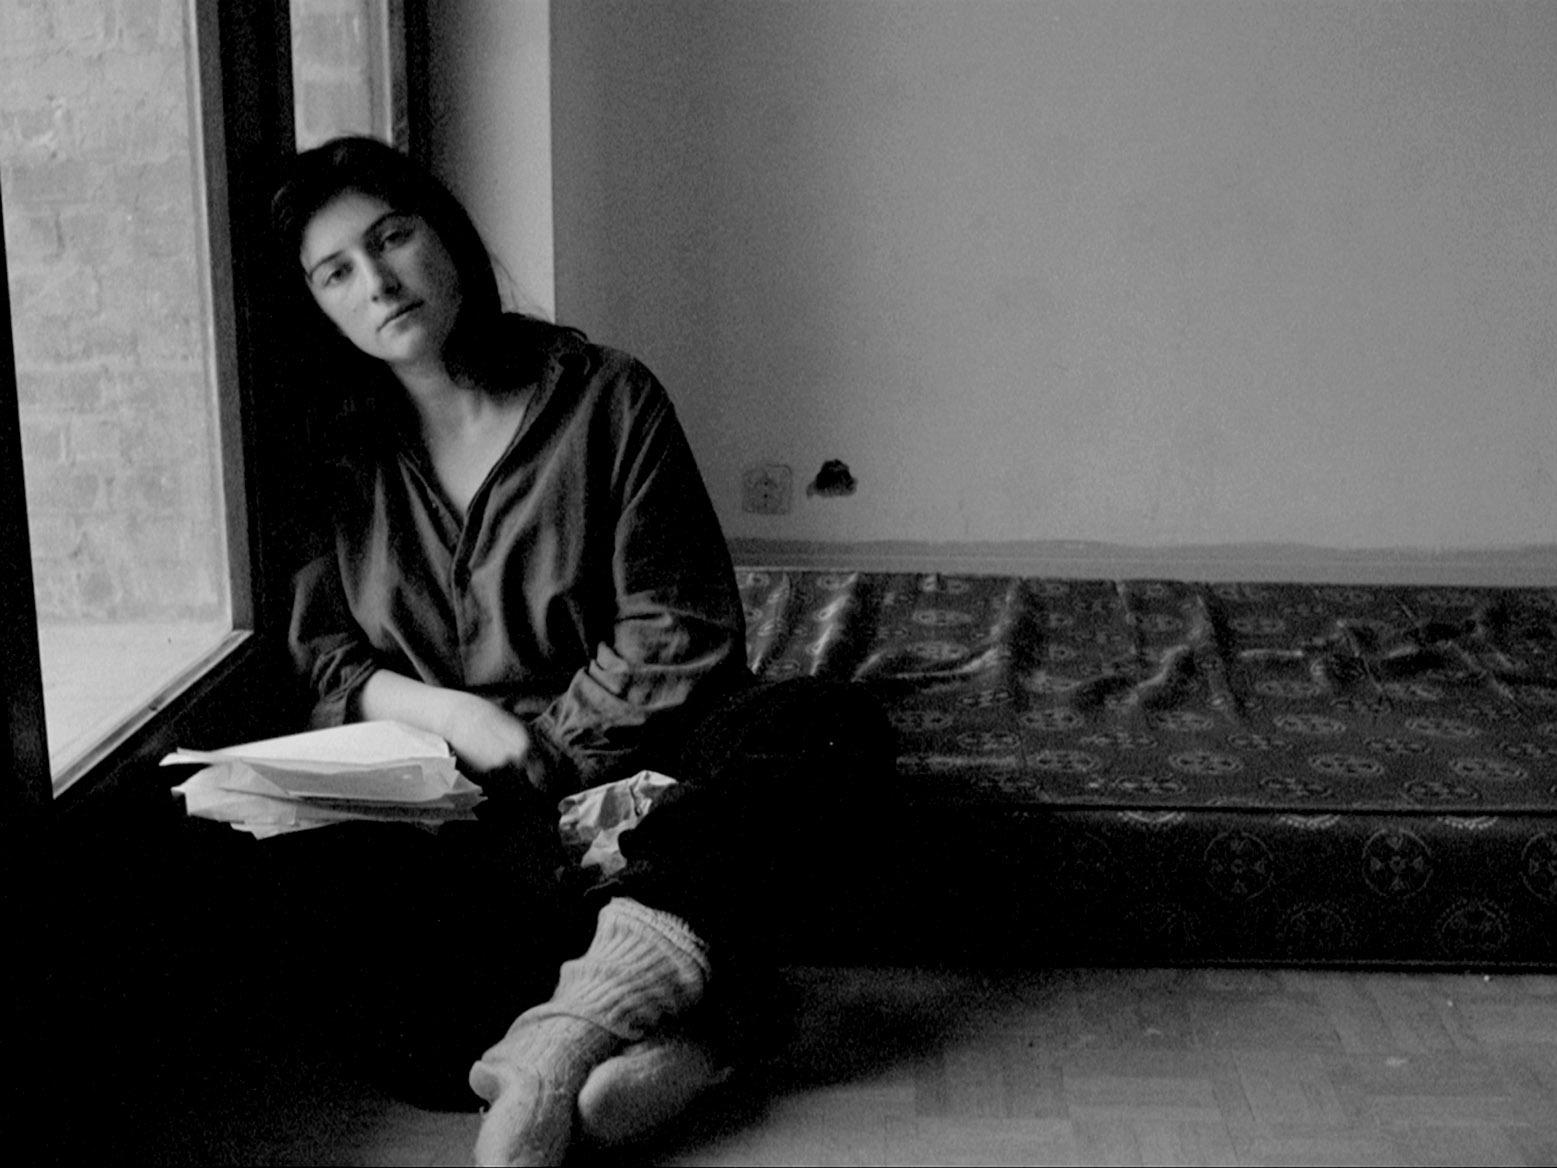 Retrospective Roundtable: Chantal Akerman